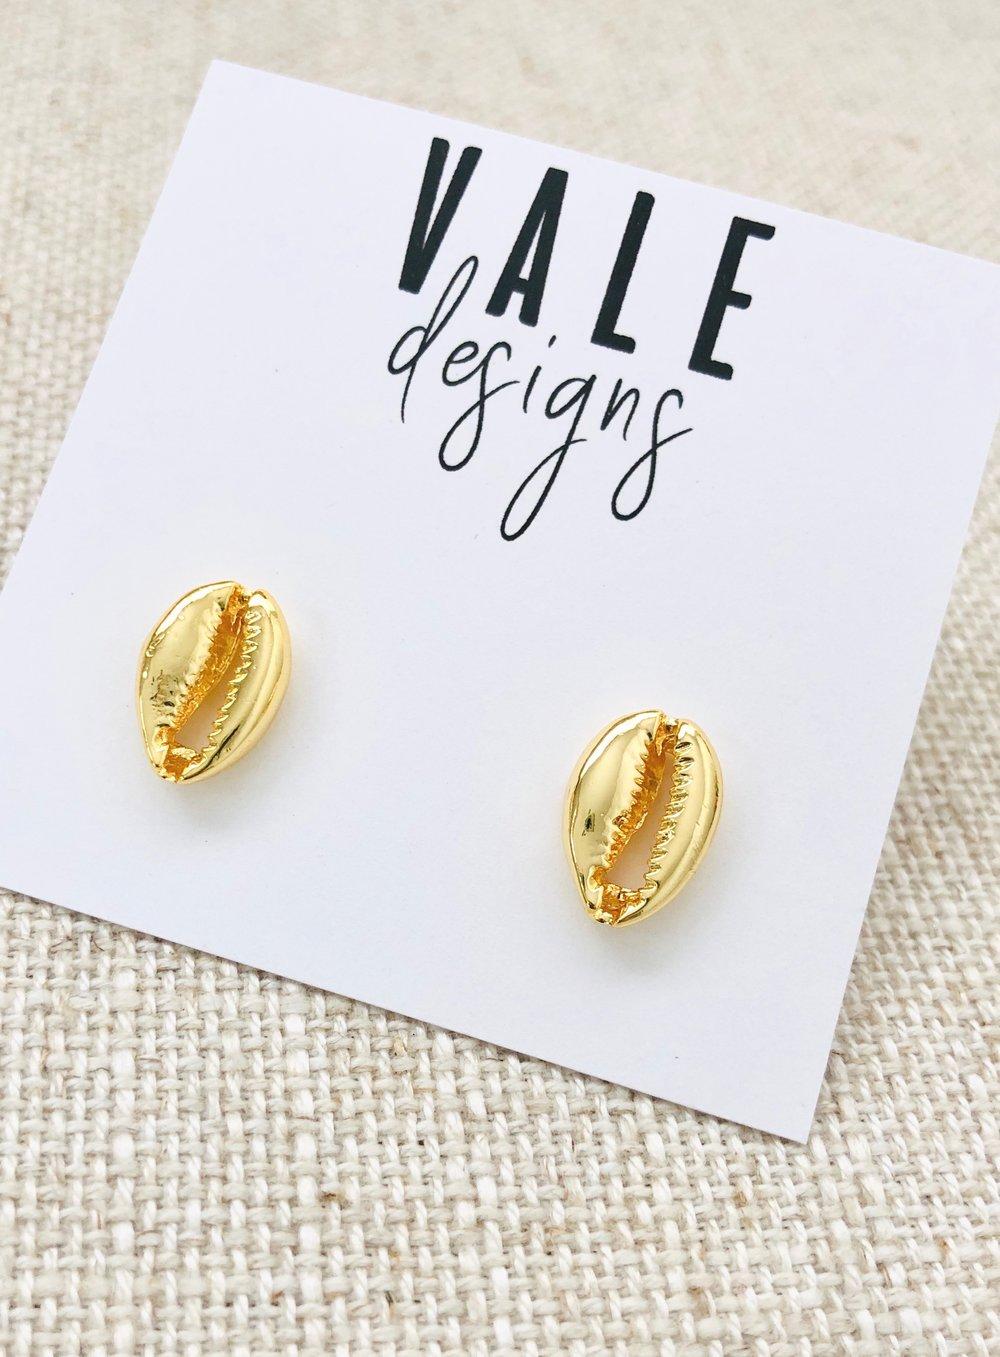 Vale Designs - $15 (LOVE)